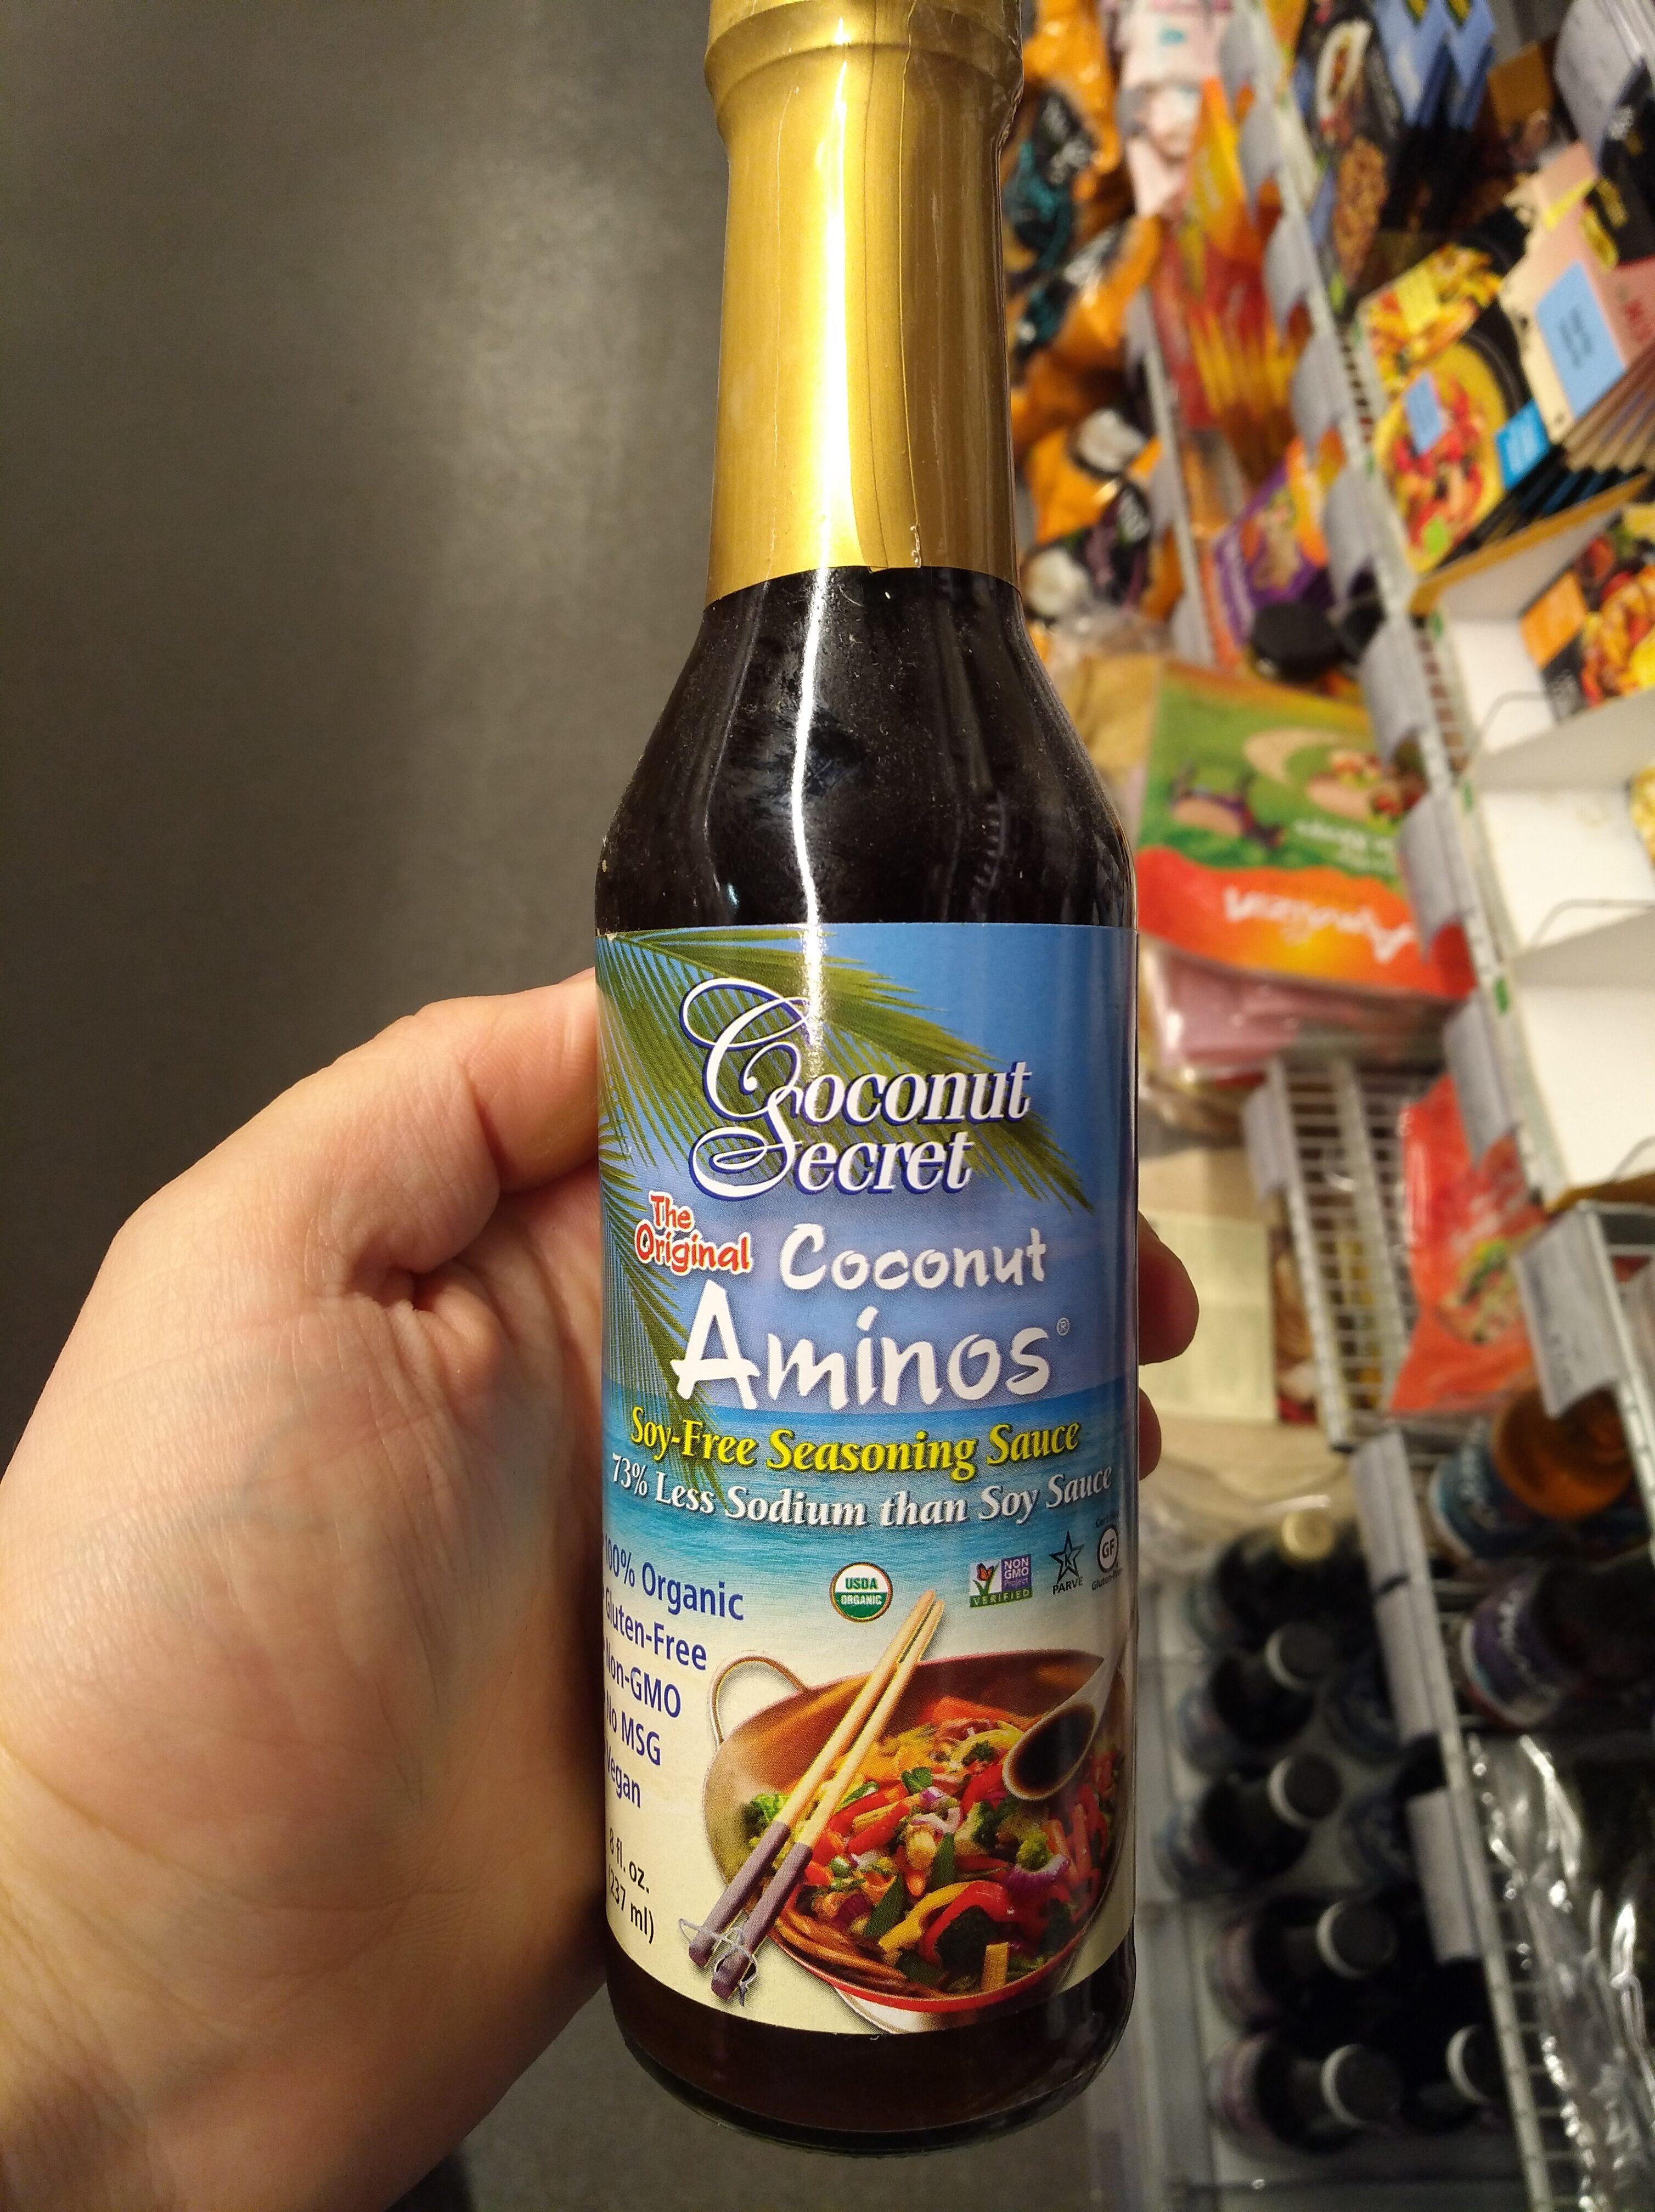 Coconut aminos soy-free seasoning sauce - Product - nl